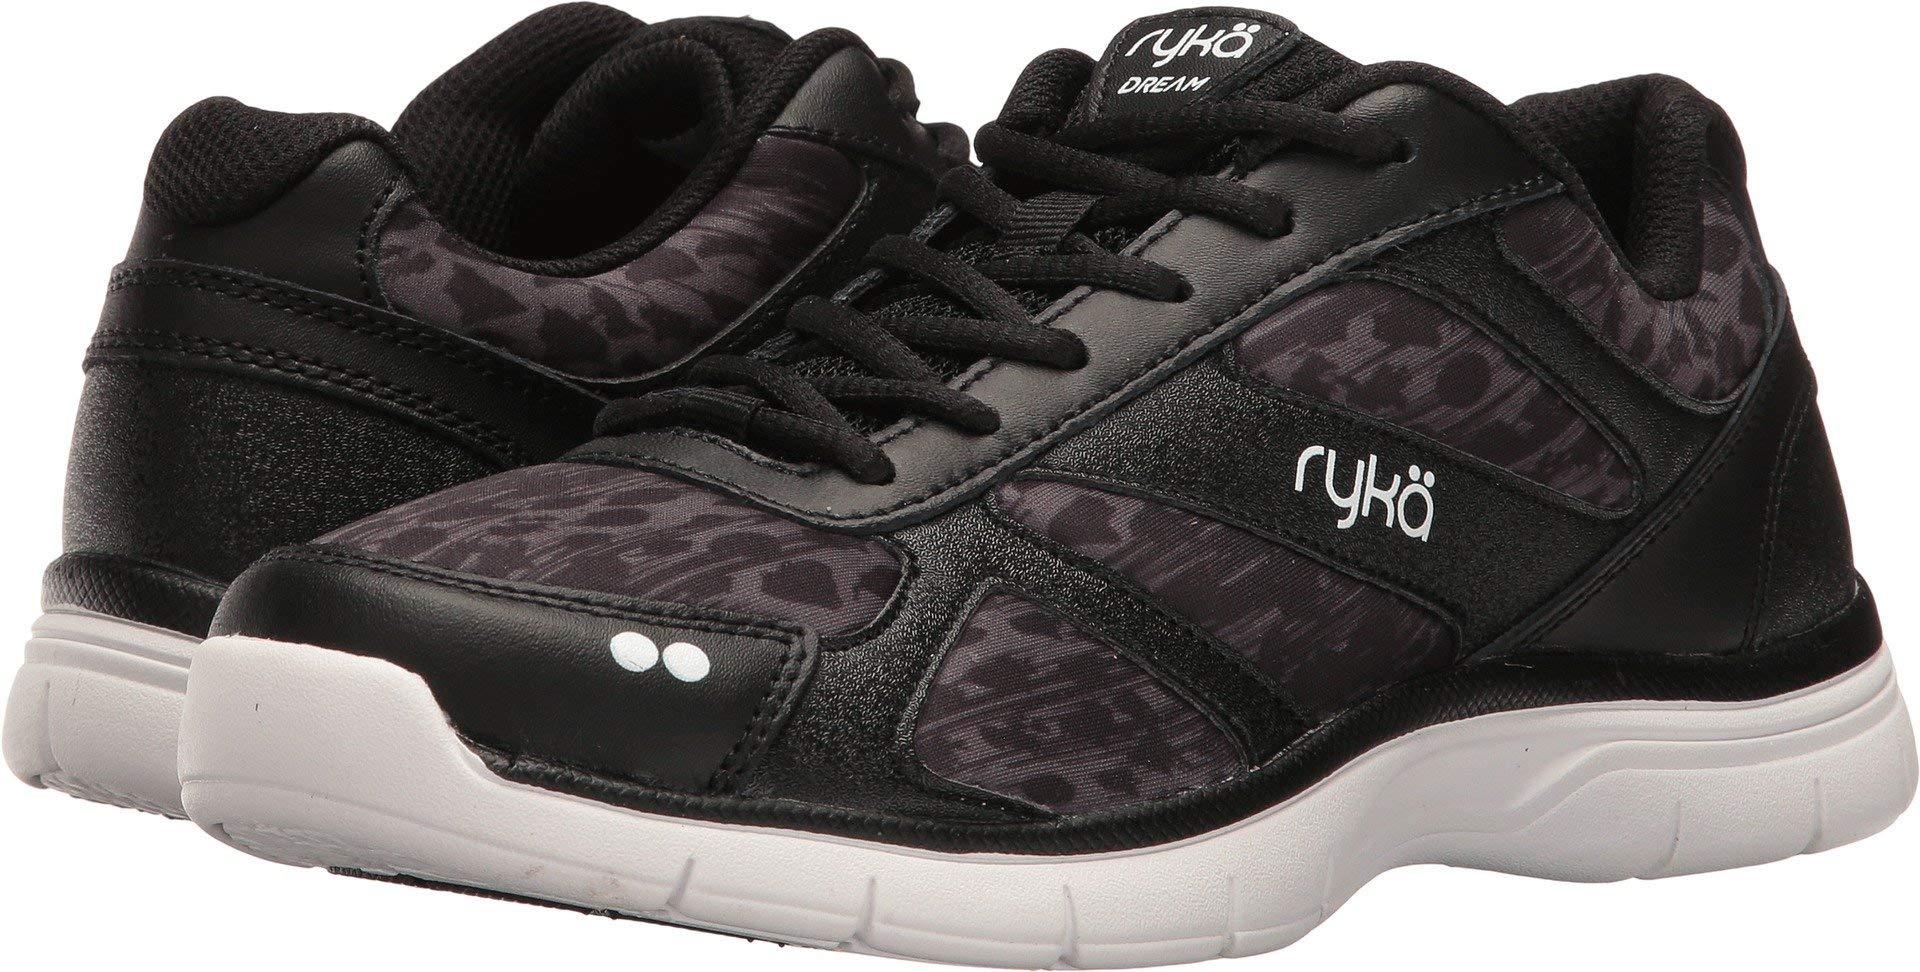 Ryka Women's Dream SMT Black/Iron Grey/White 11 B US